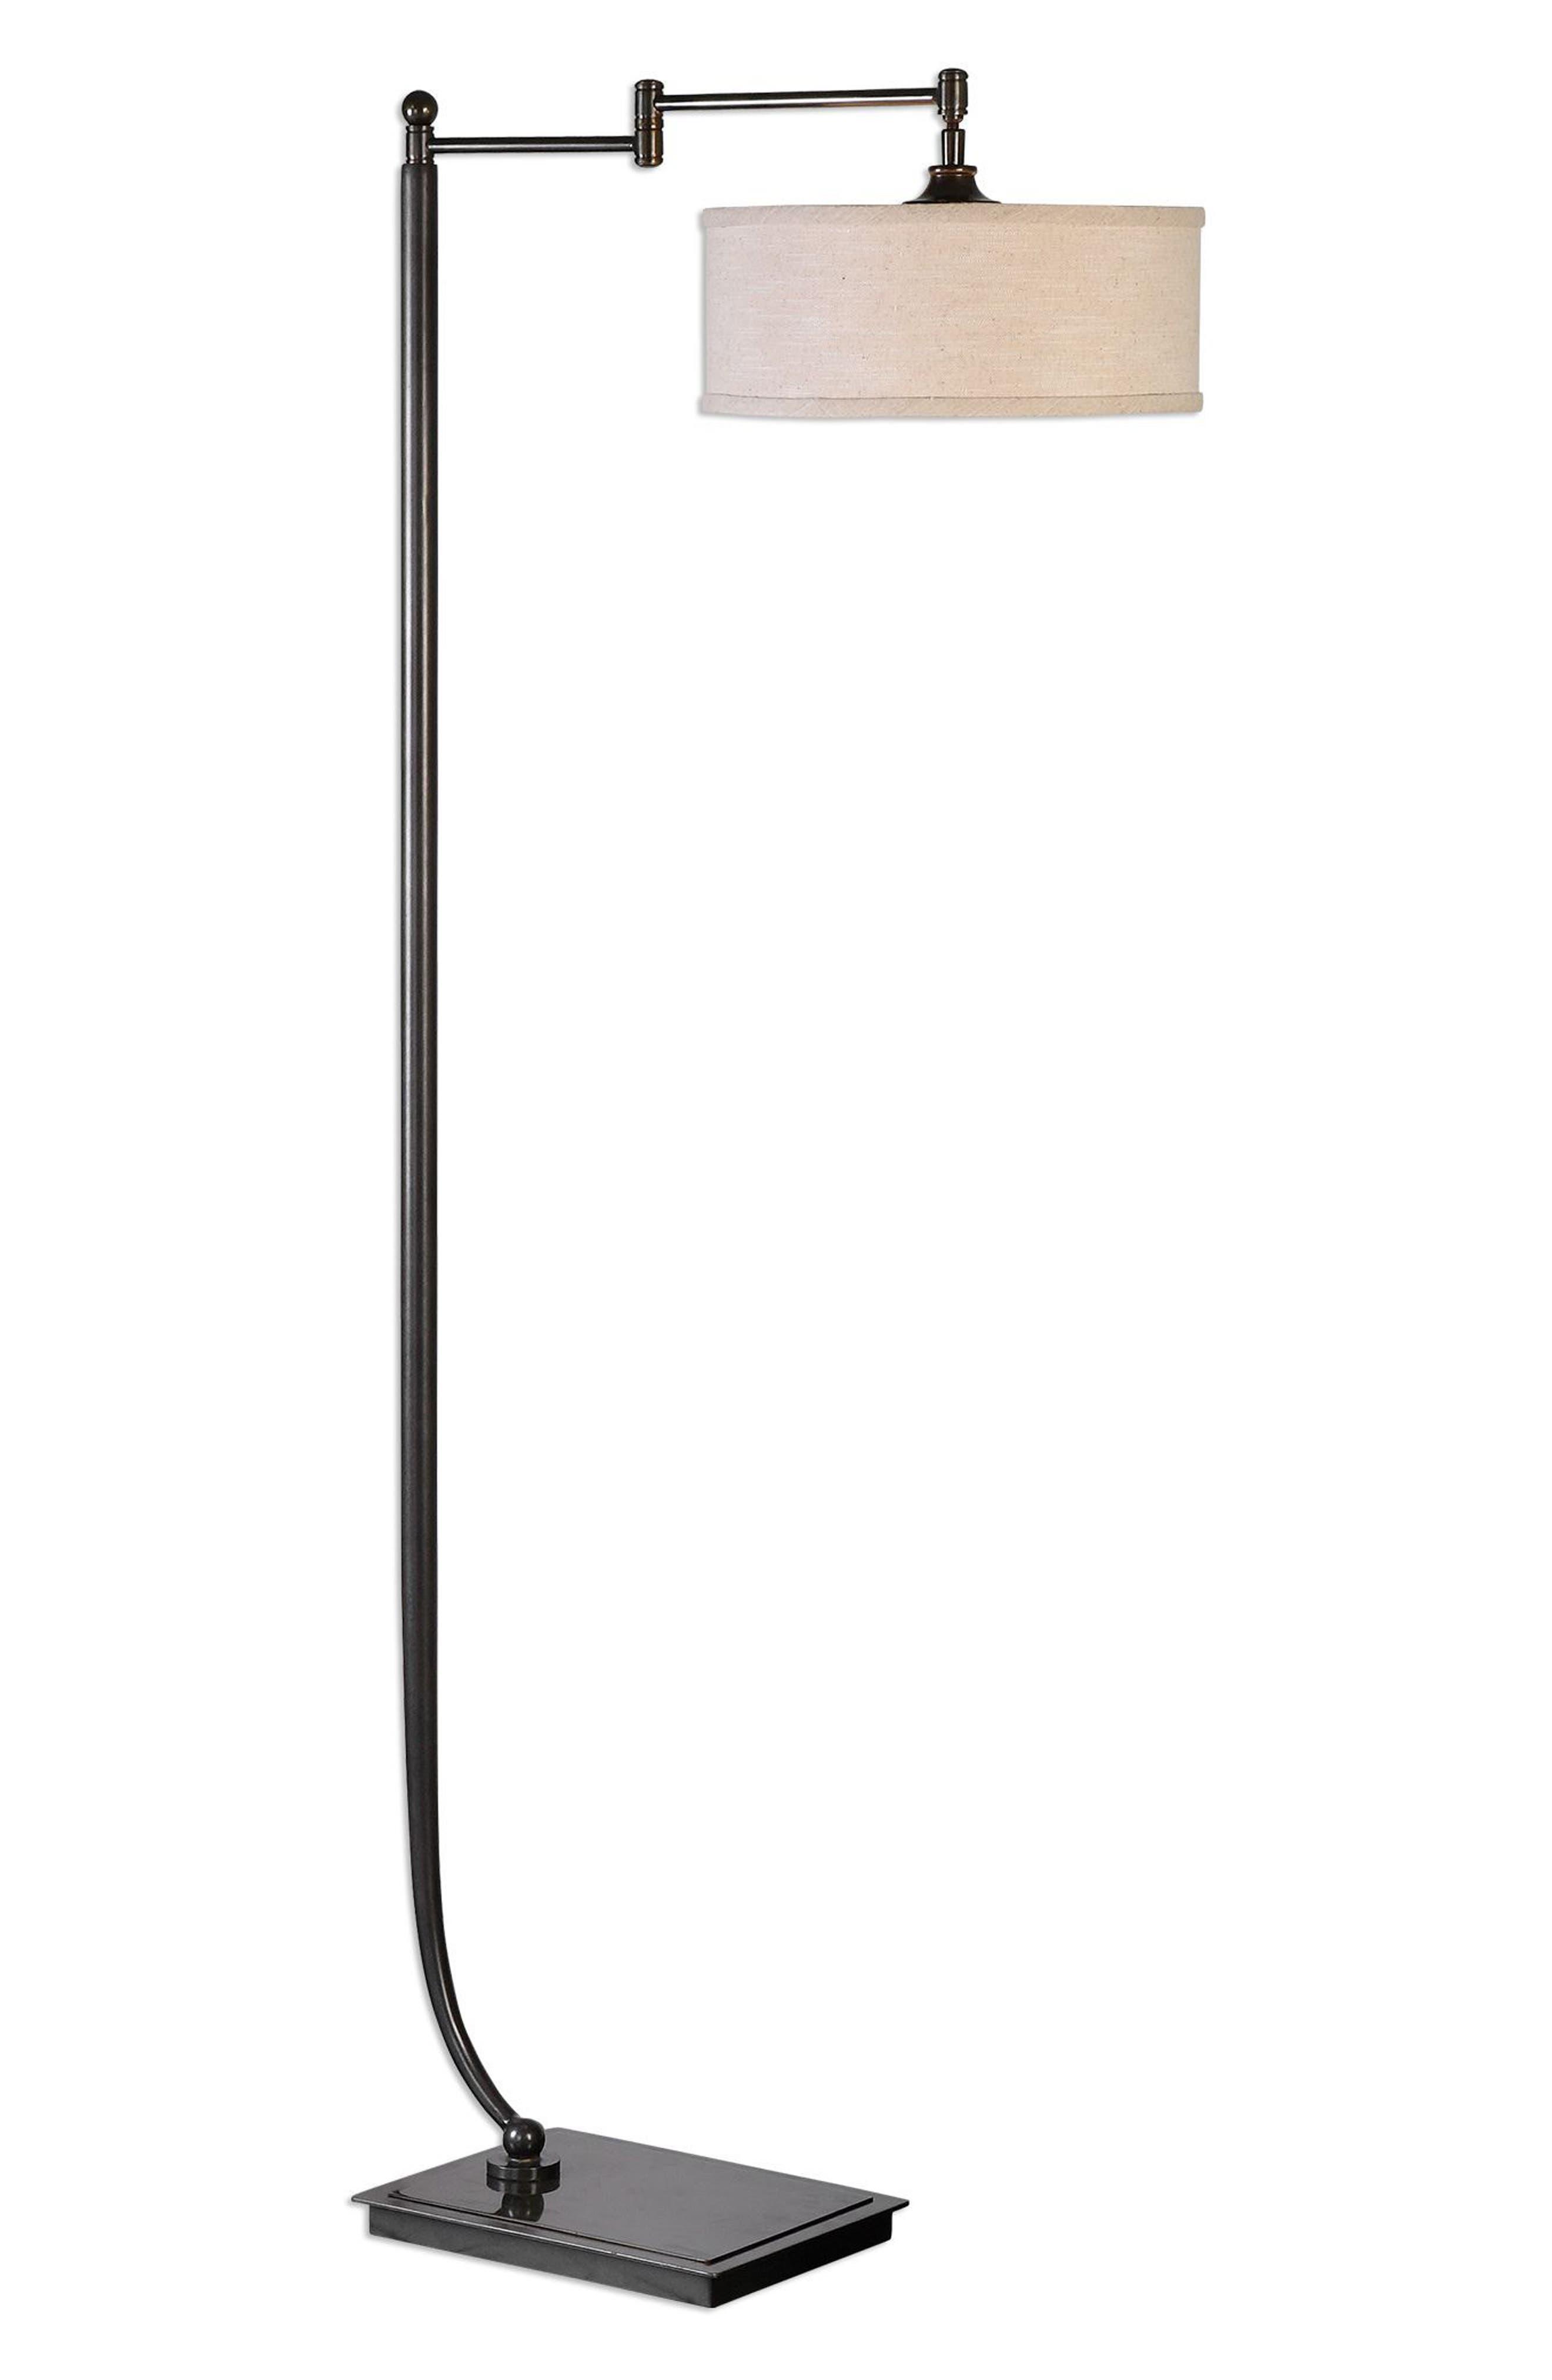 Main Image - Uttermost Lamine Floor Lamp